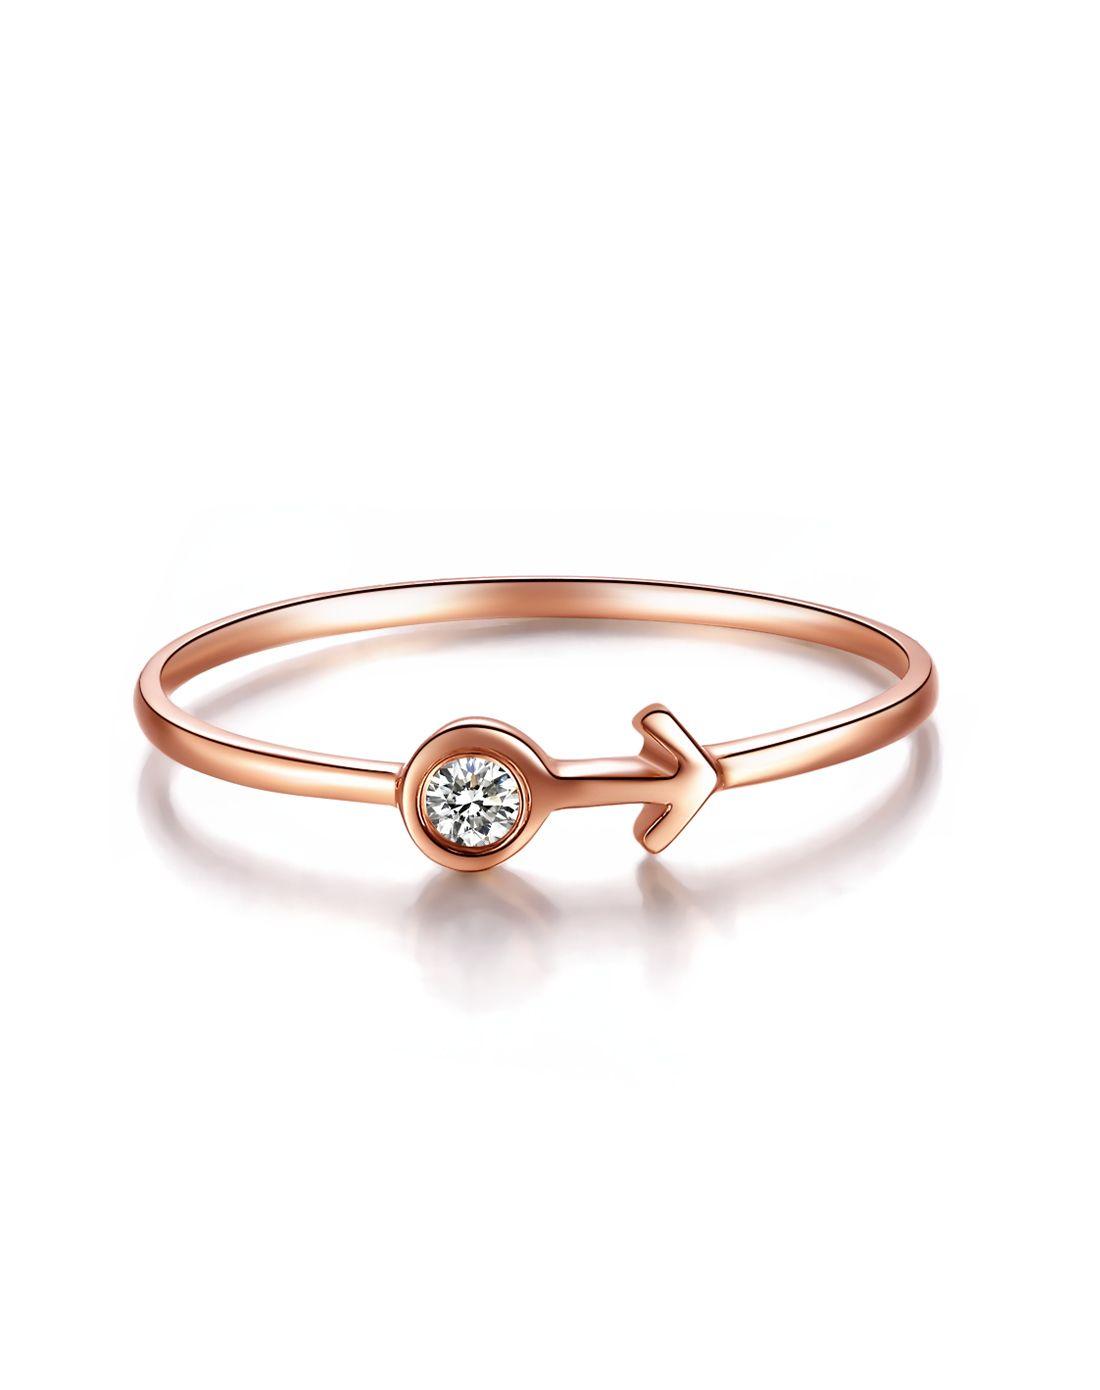 18k玫瑰金钻石戒指 情侣符号